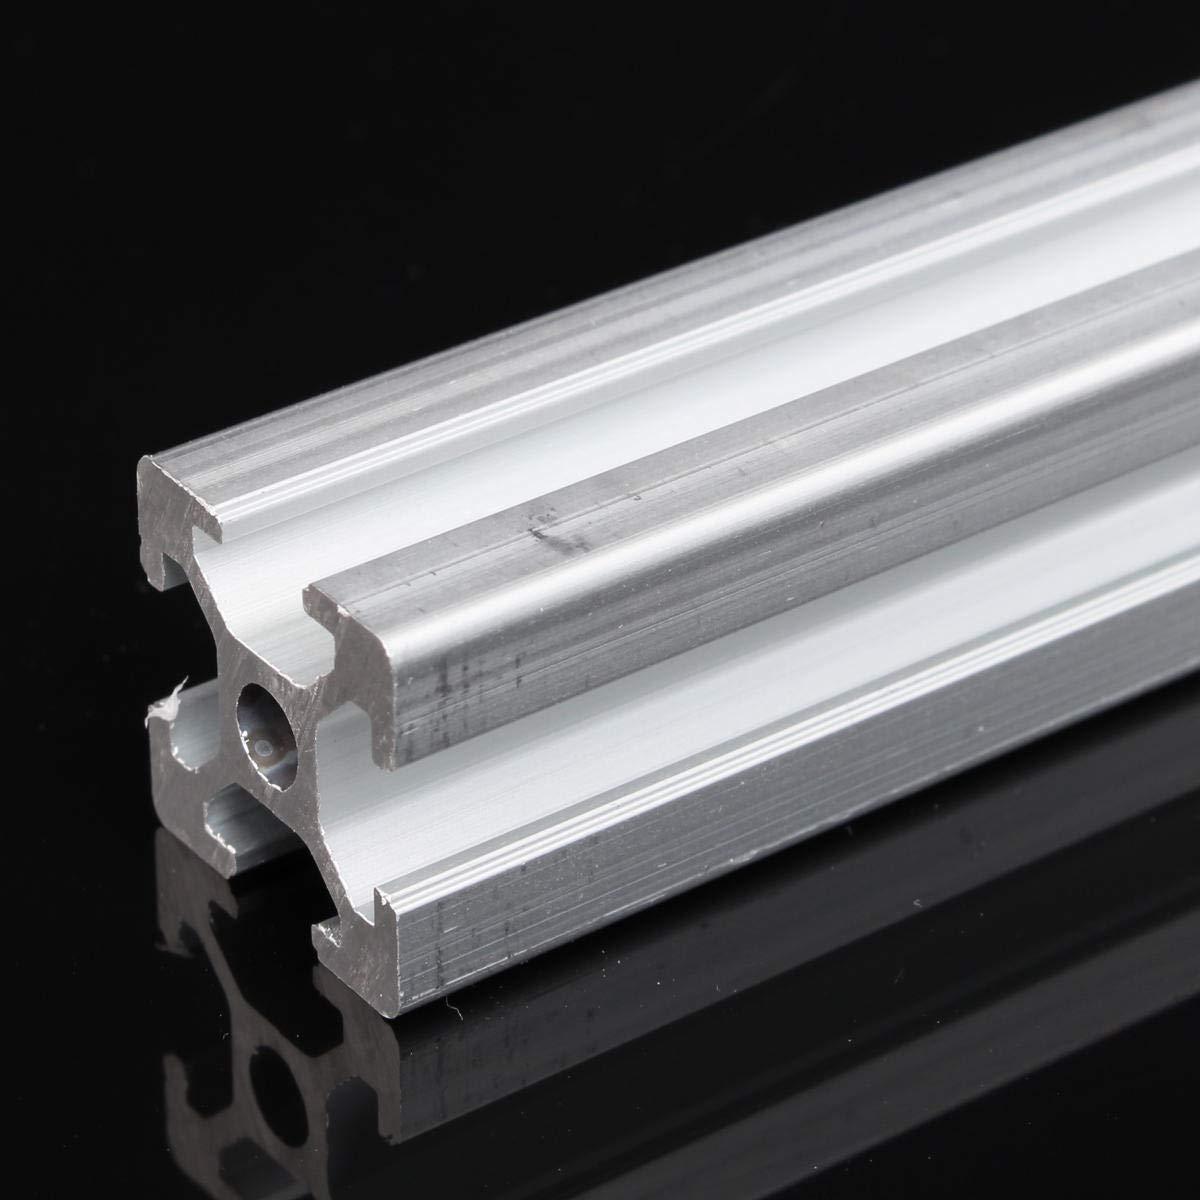 OKIl Machifit 500mm Length 2020 T-Slot Aluminum Profile Extrusion Frame For CNC